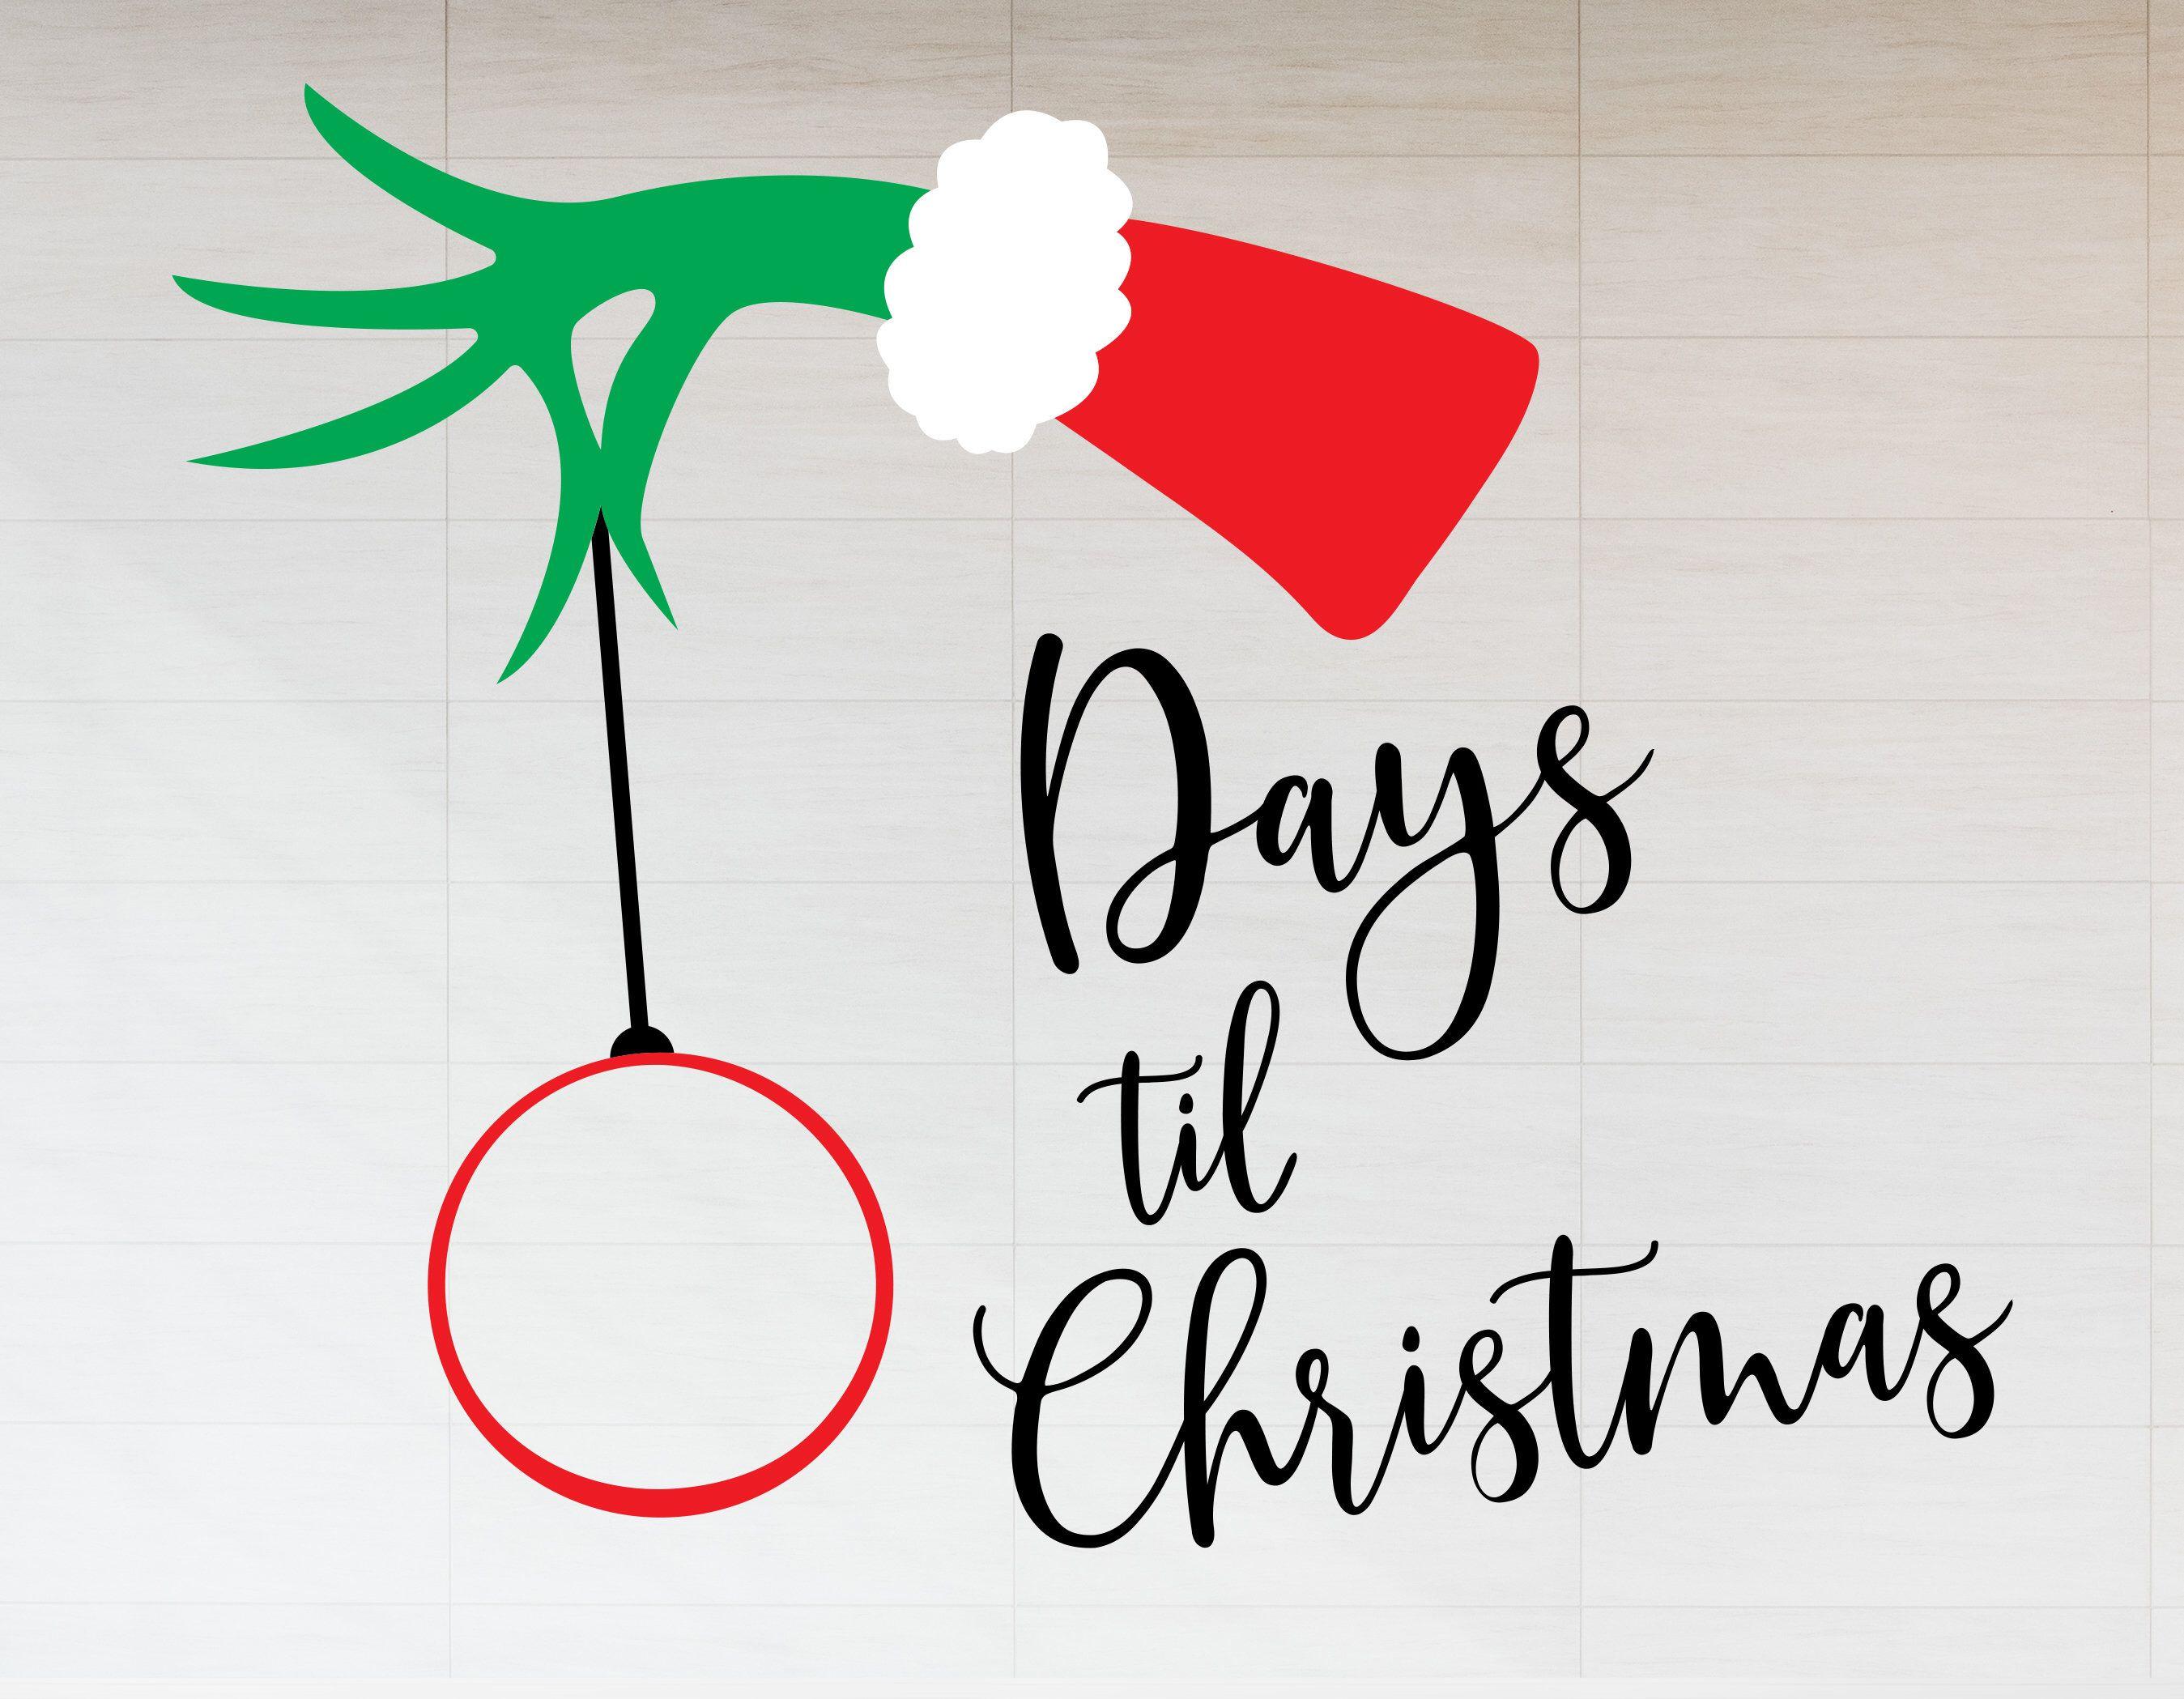 Grinch Days Till Christmas Svg Days Till Christmas Svg The Etsy Days Till Christmas Christmas Svg Poster Stickers